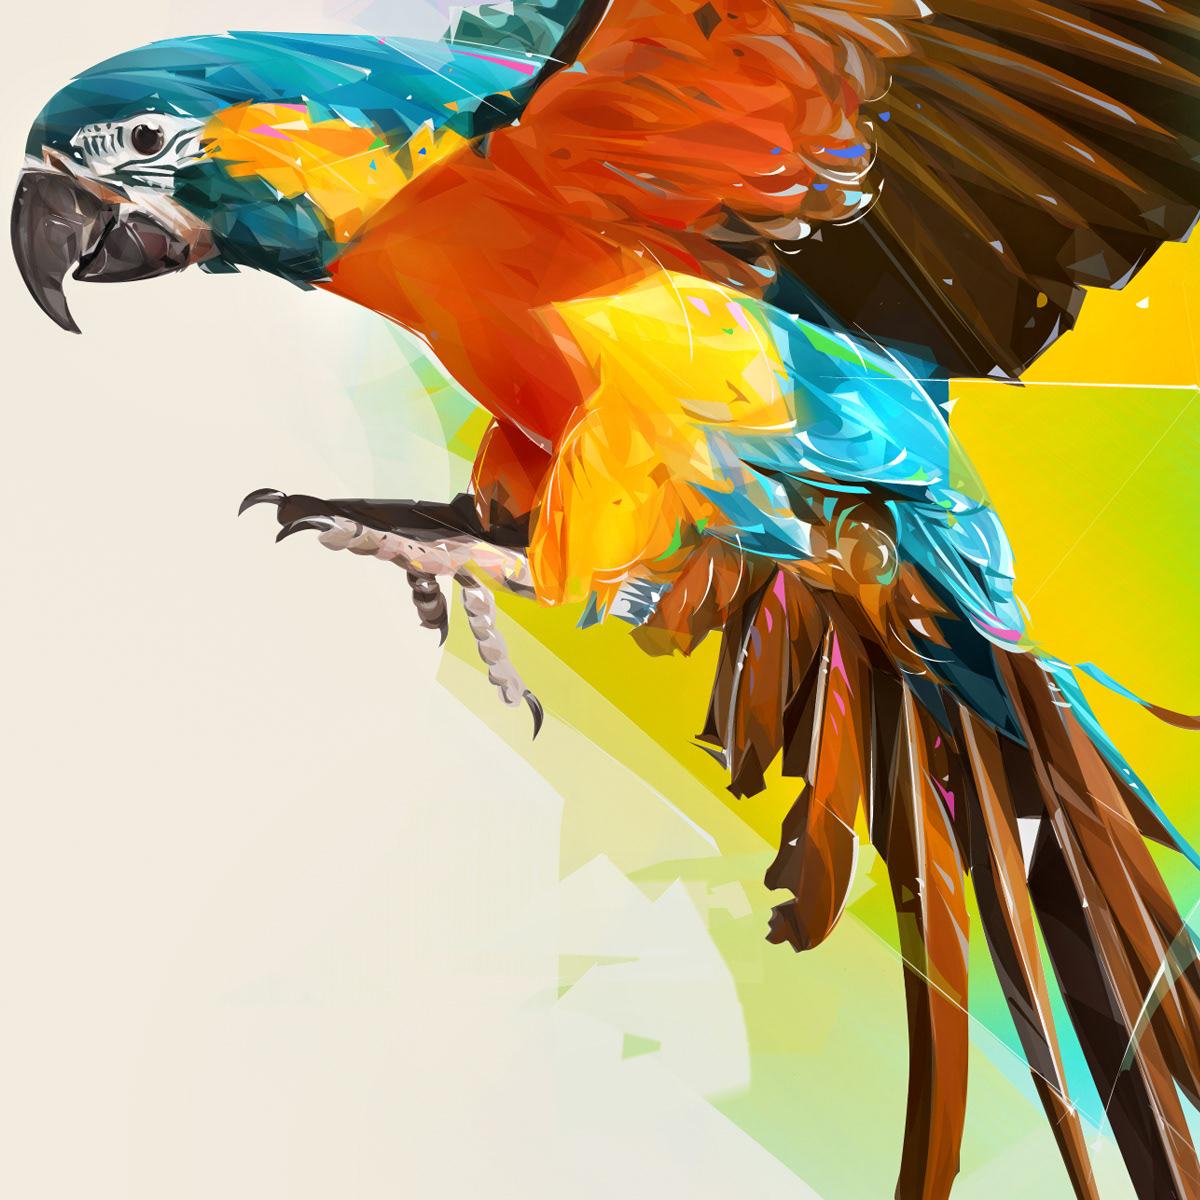 beauty bird cover design Nature parrot Pop Art portrait wild life animals